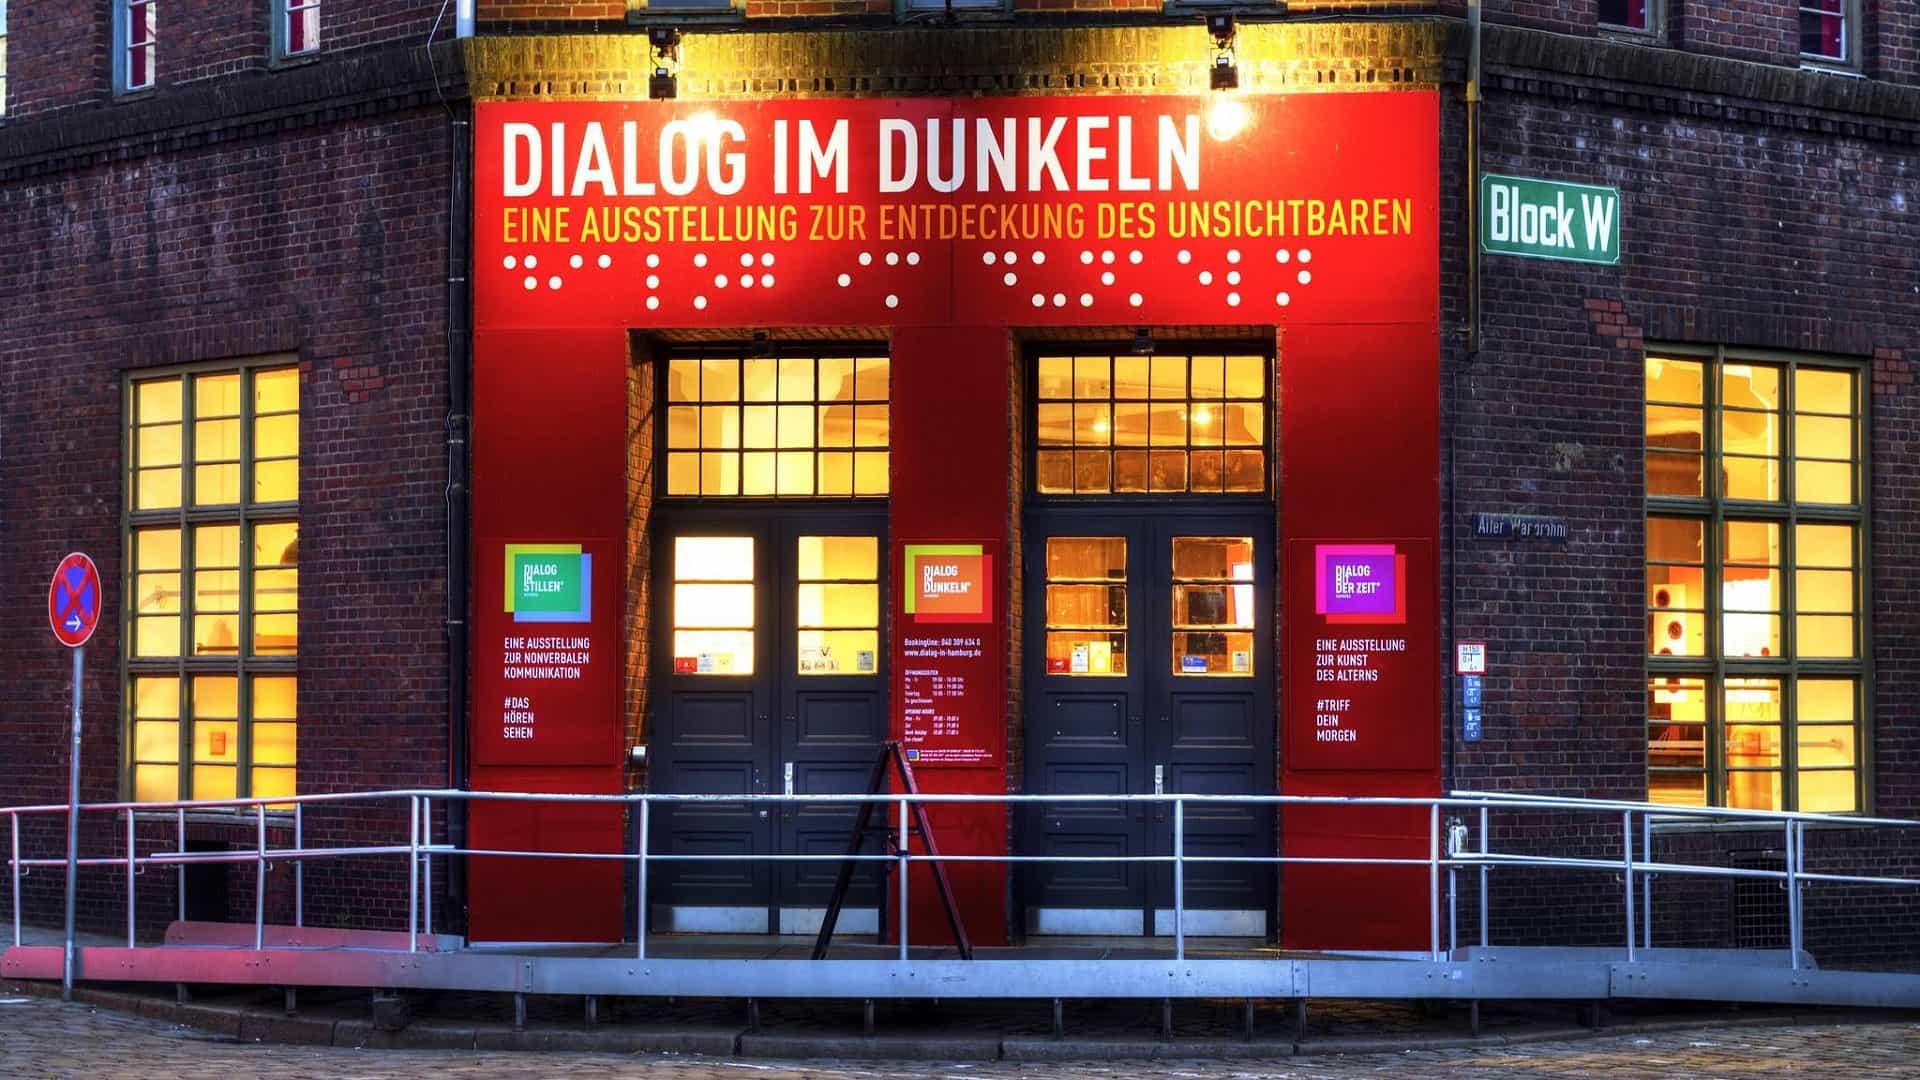 hamburg dialog im dunkeln